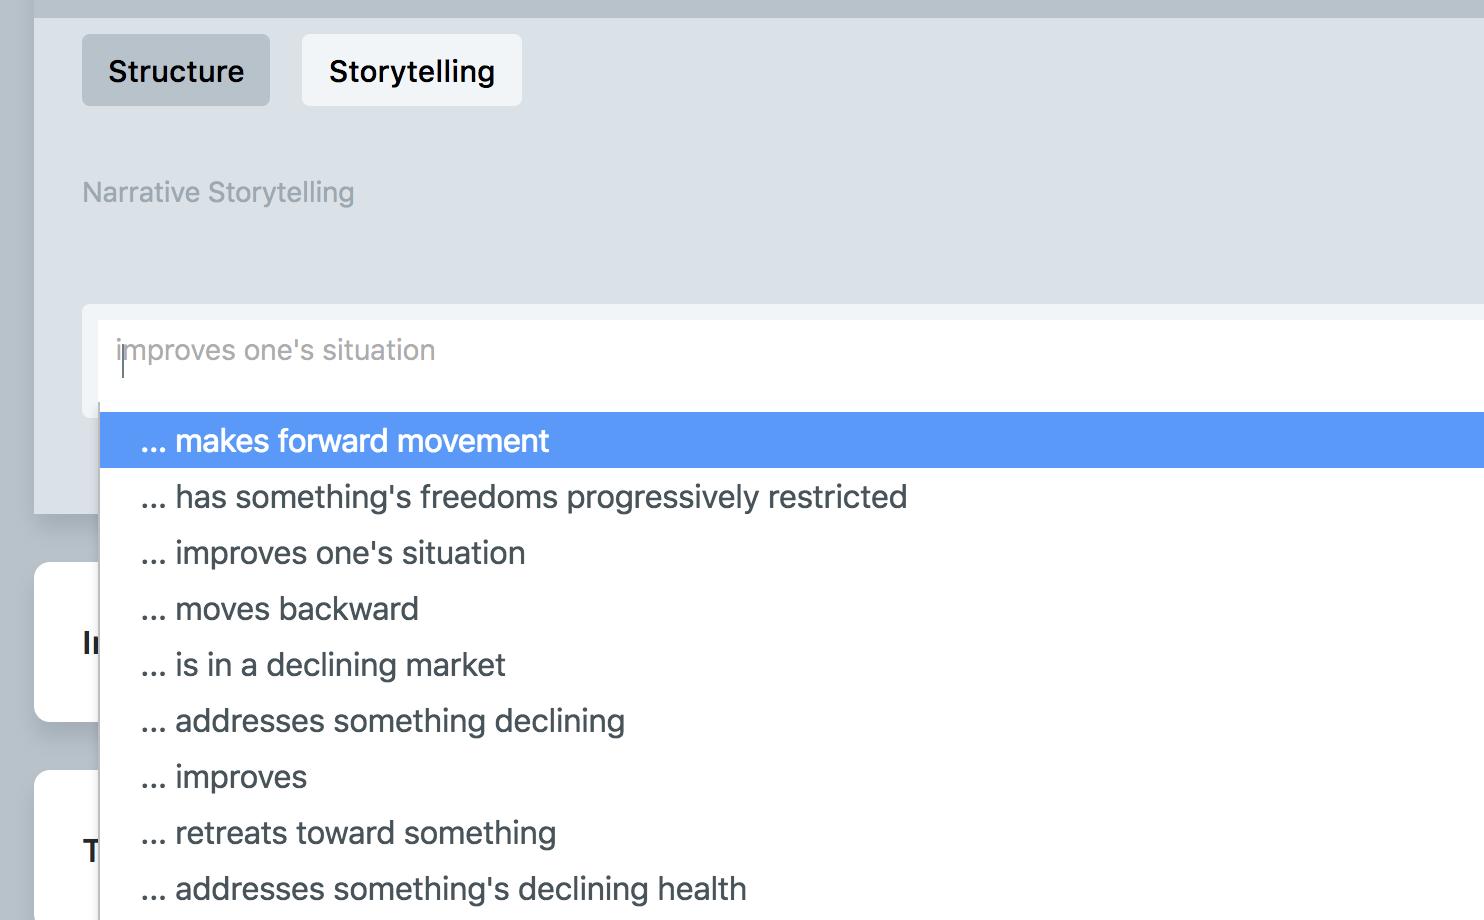 Choosing New Storytelling